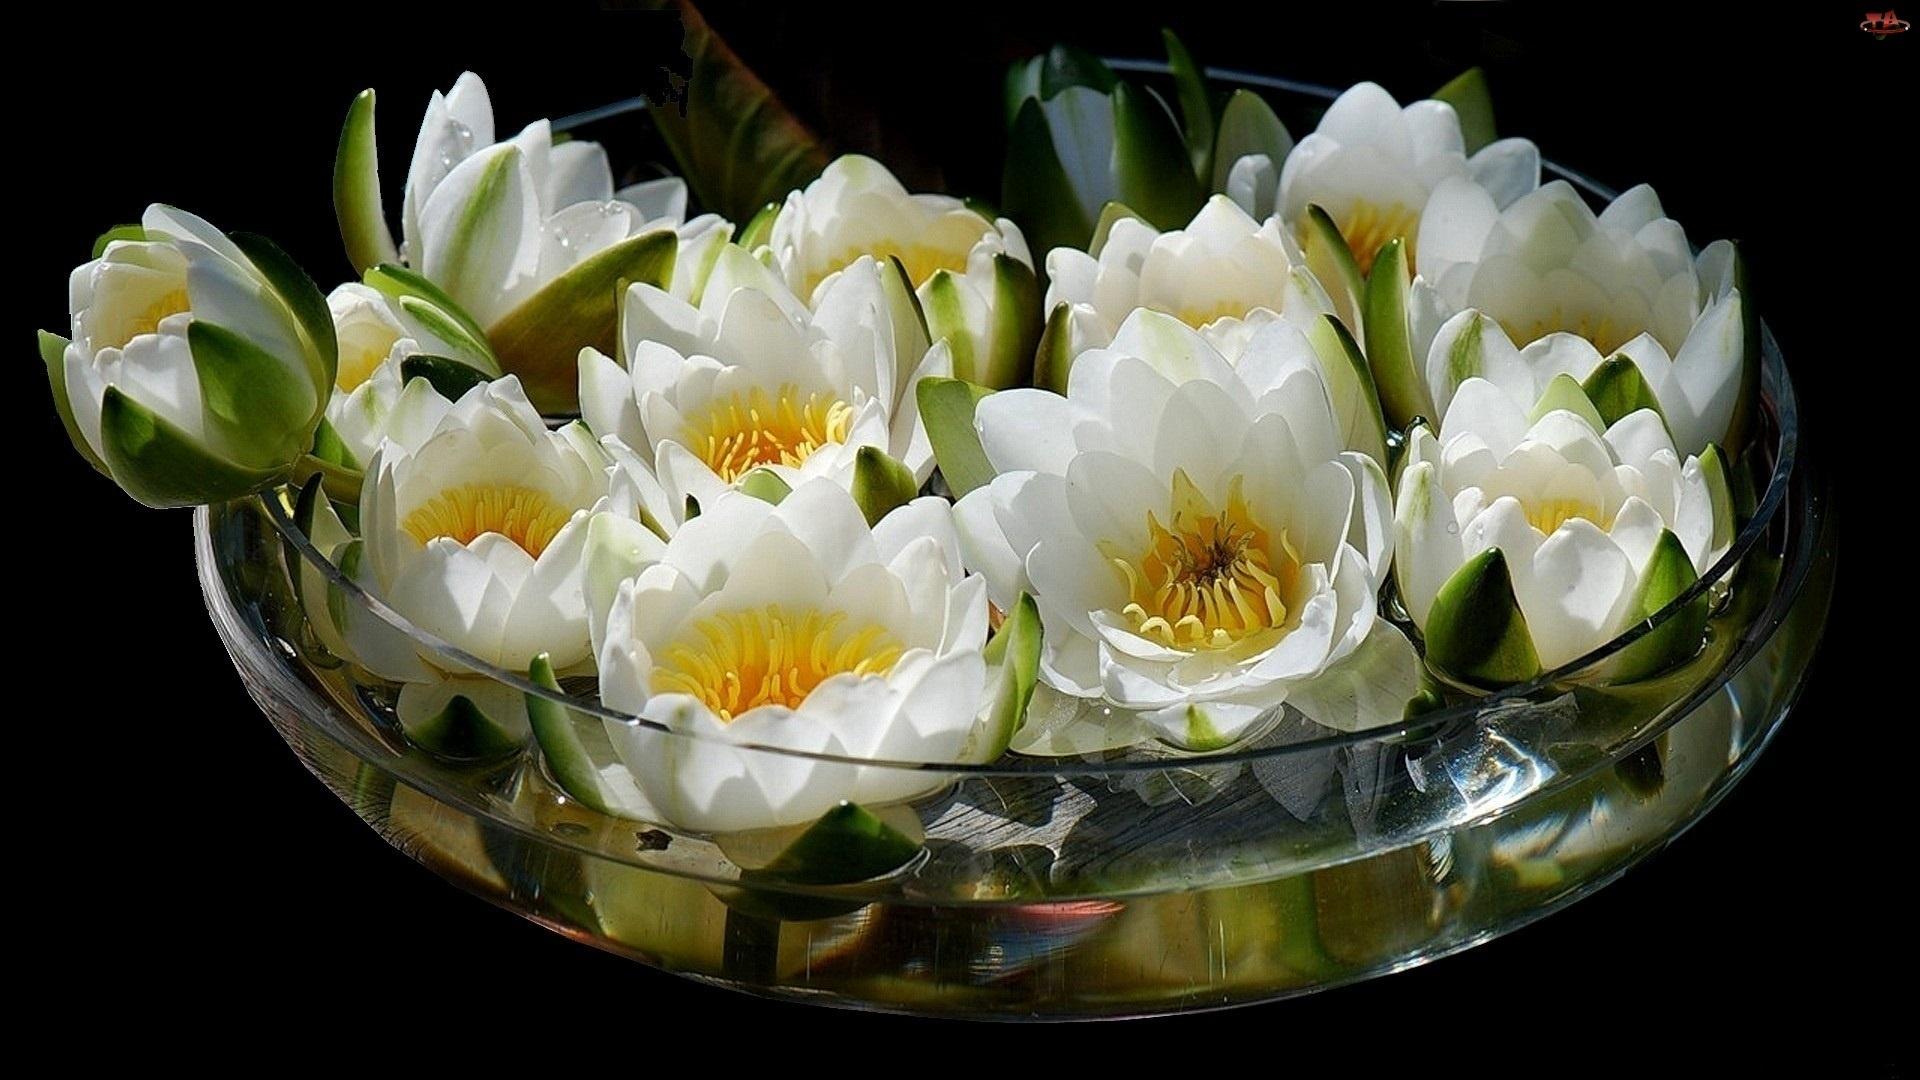 Lotus Vase Bouquet Wallpaper 1920x1080 217215 Wallpaperup